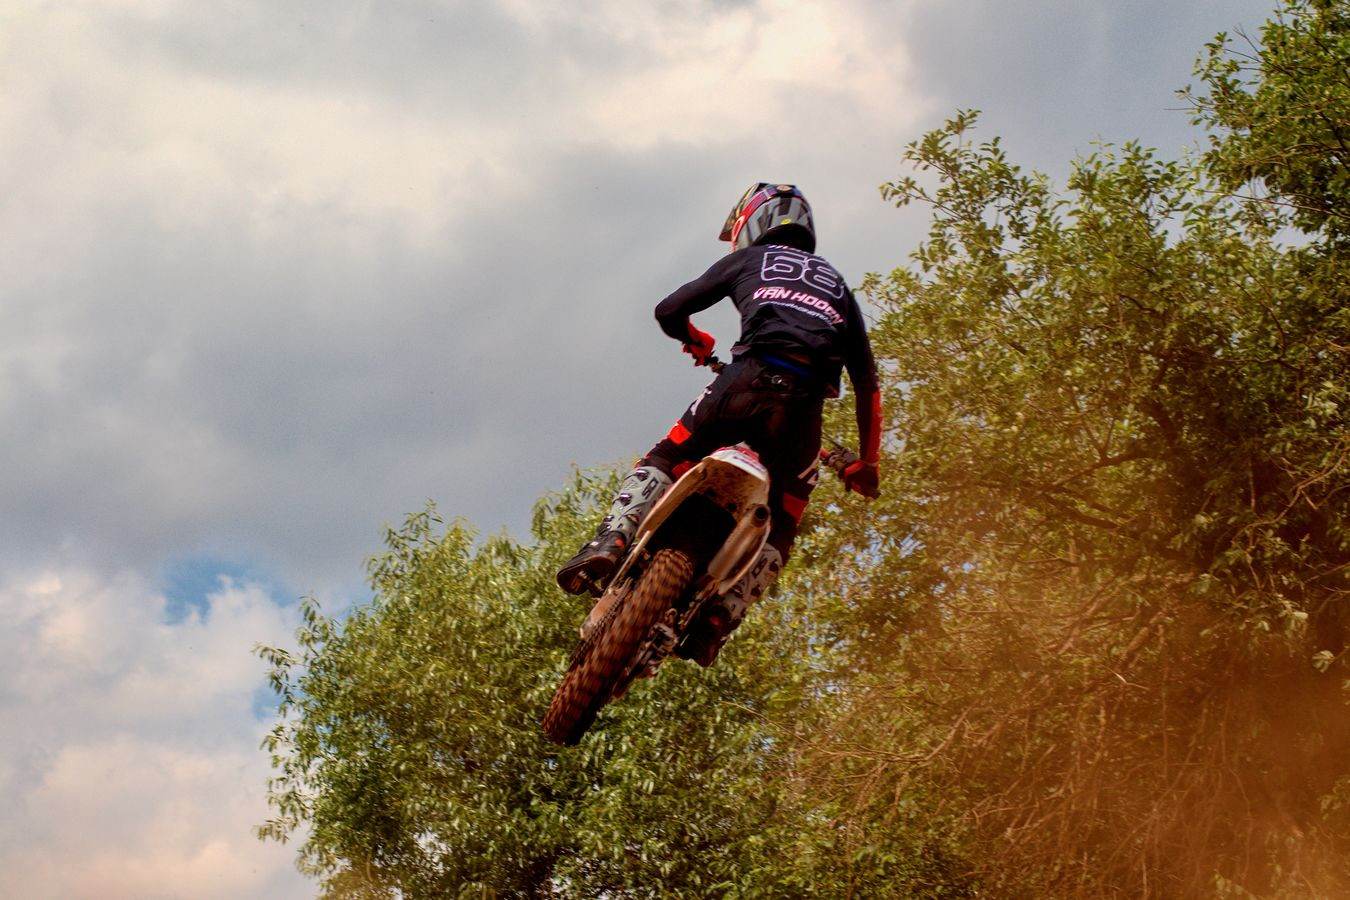 Classic Motocross